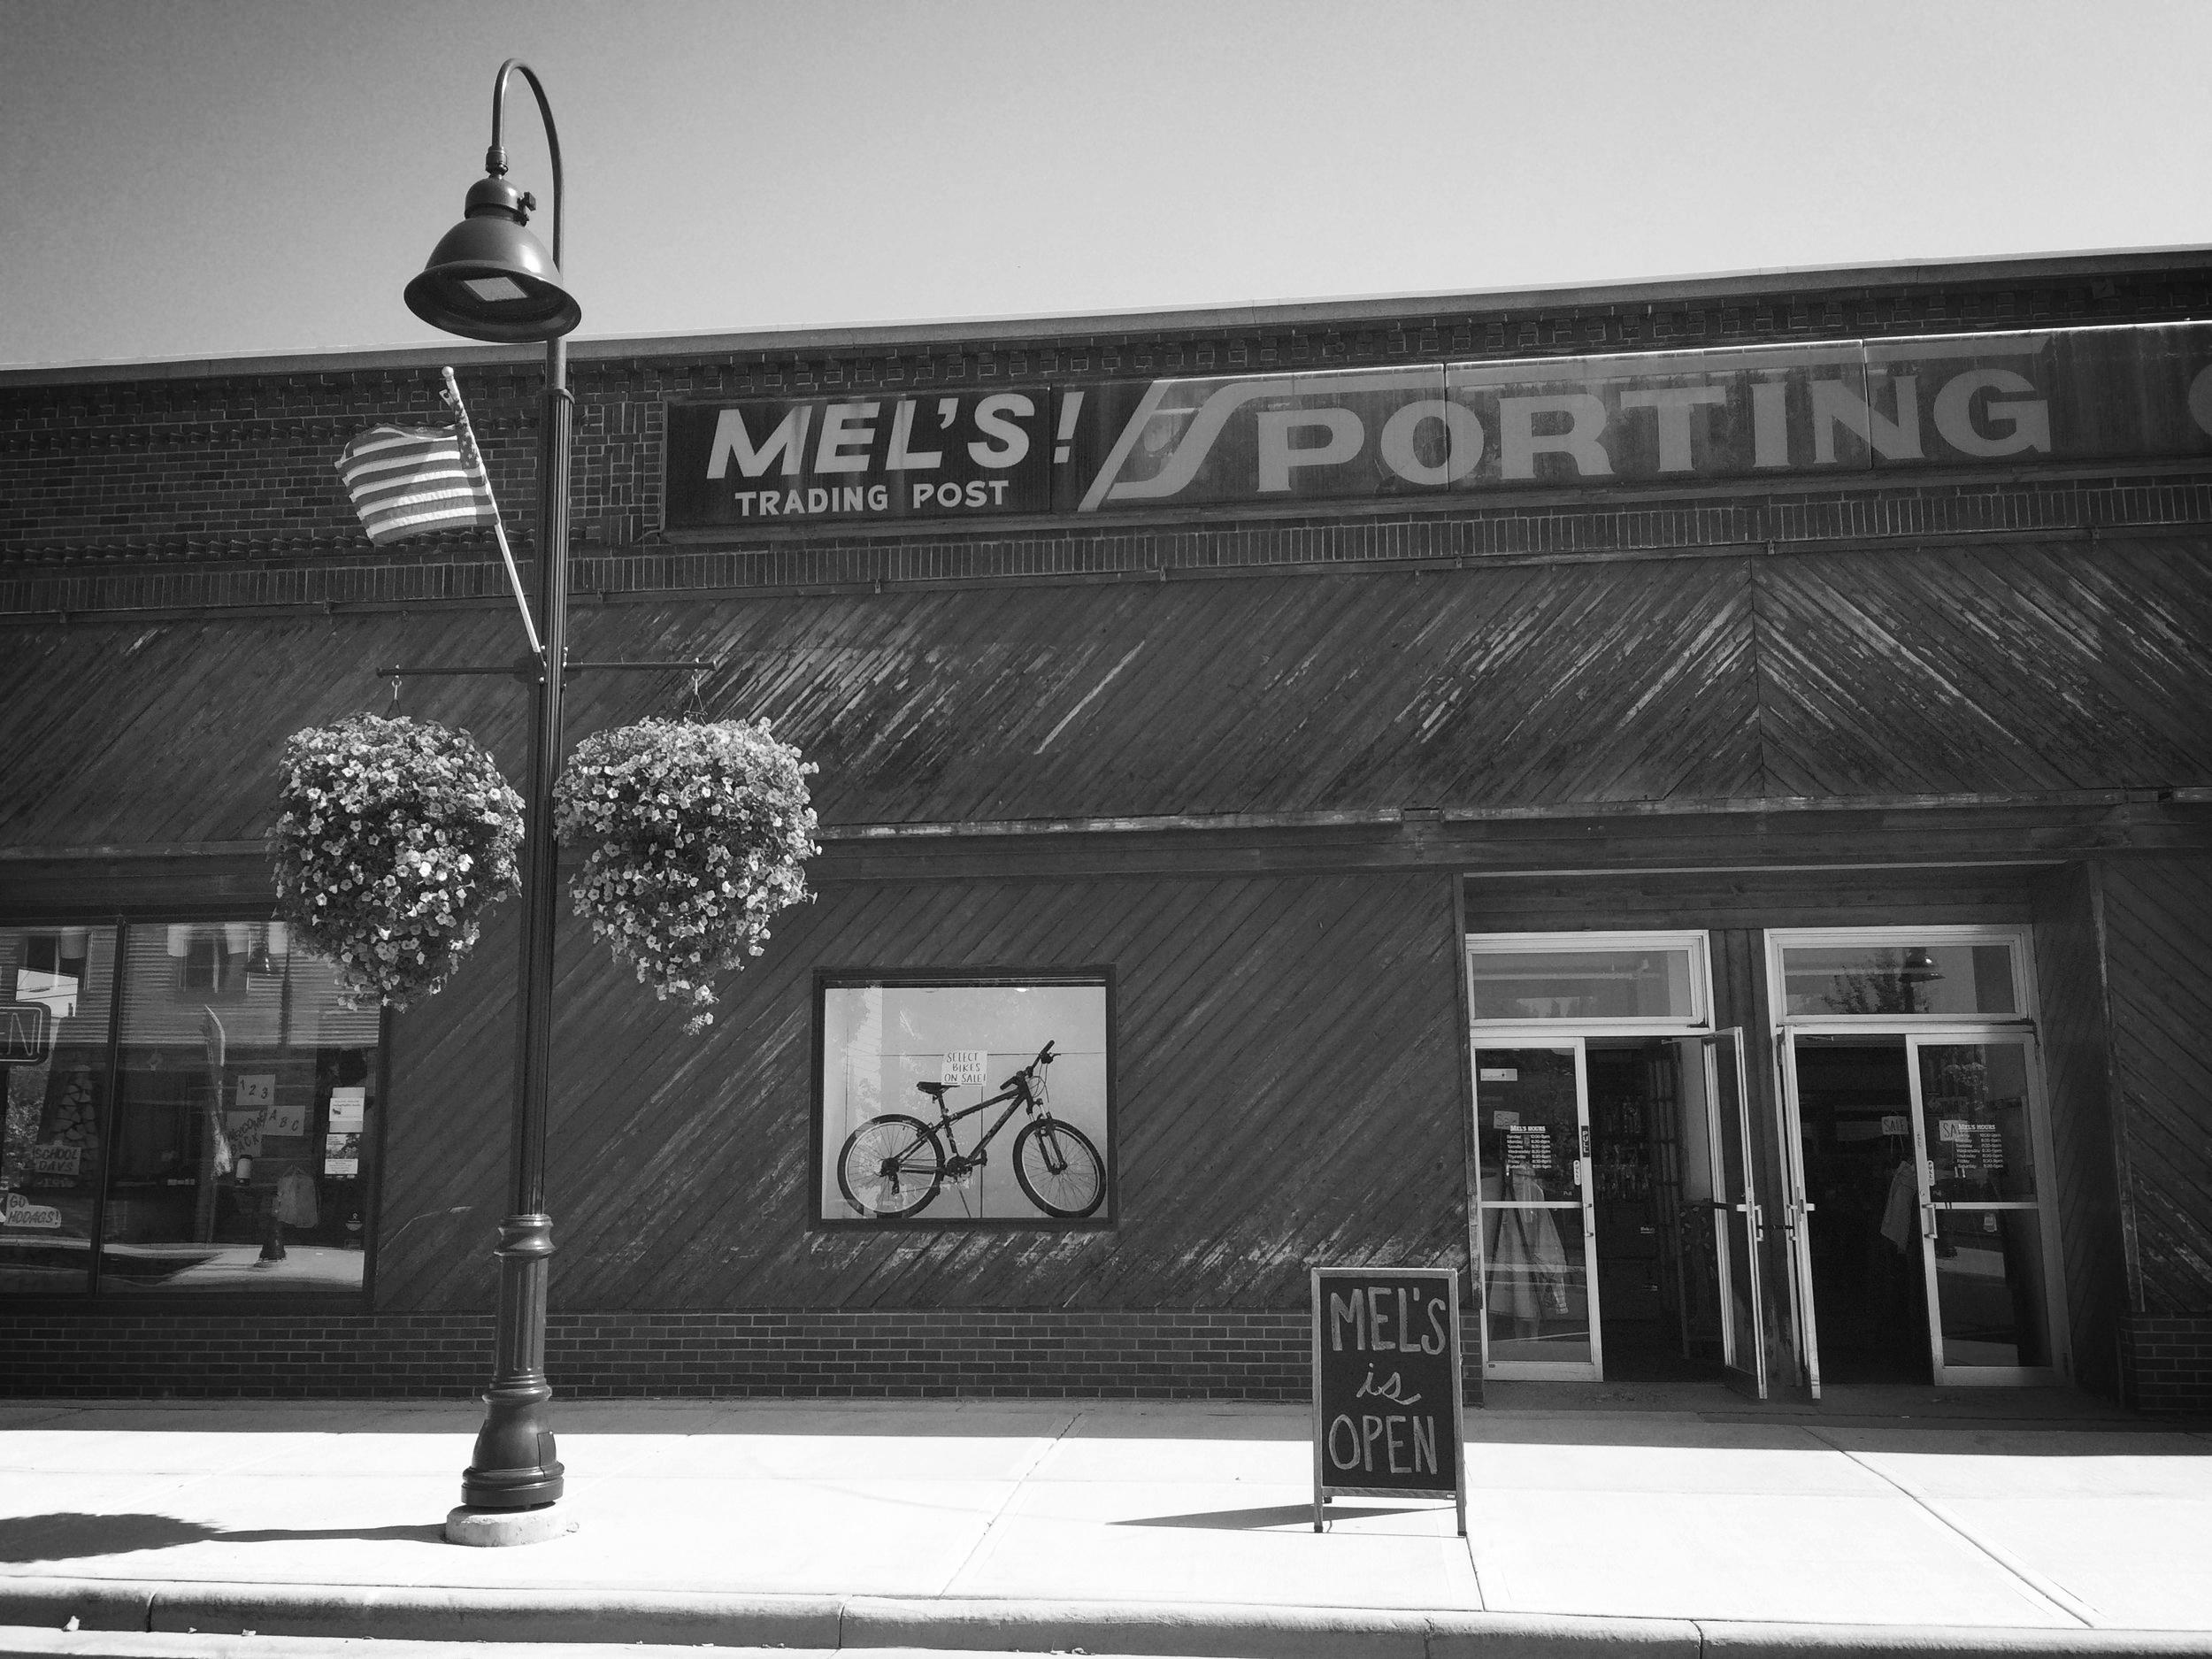 MEL'S historical storefront downtown Rhinelander.